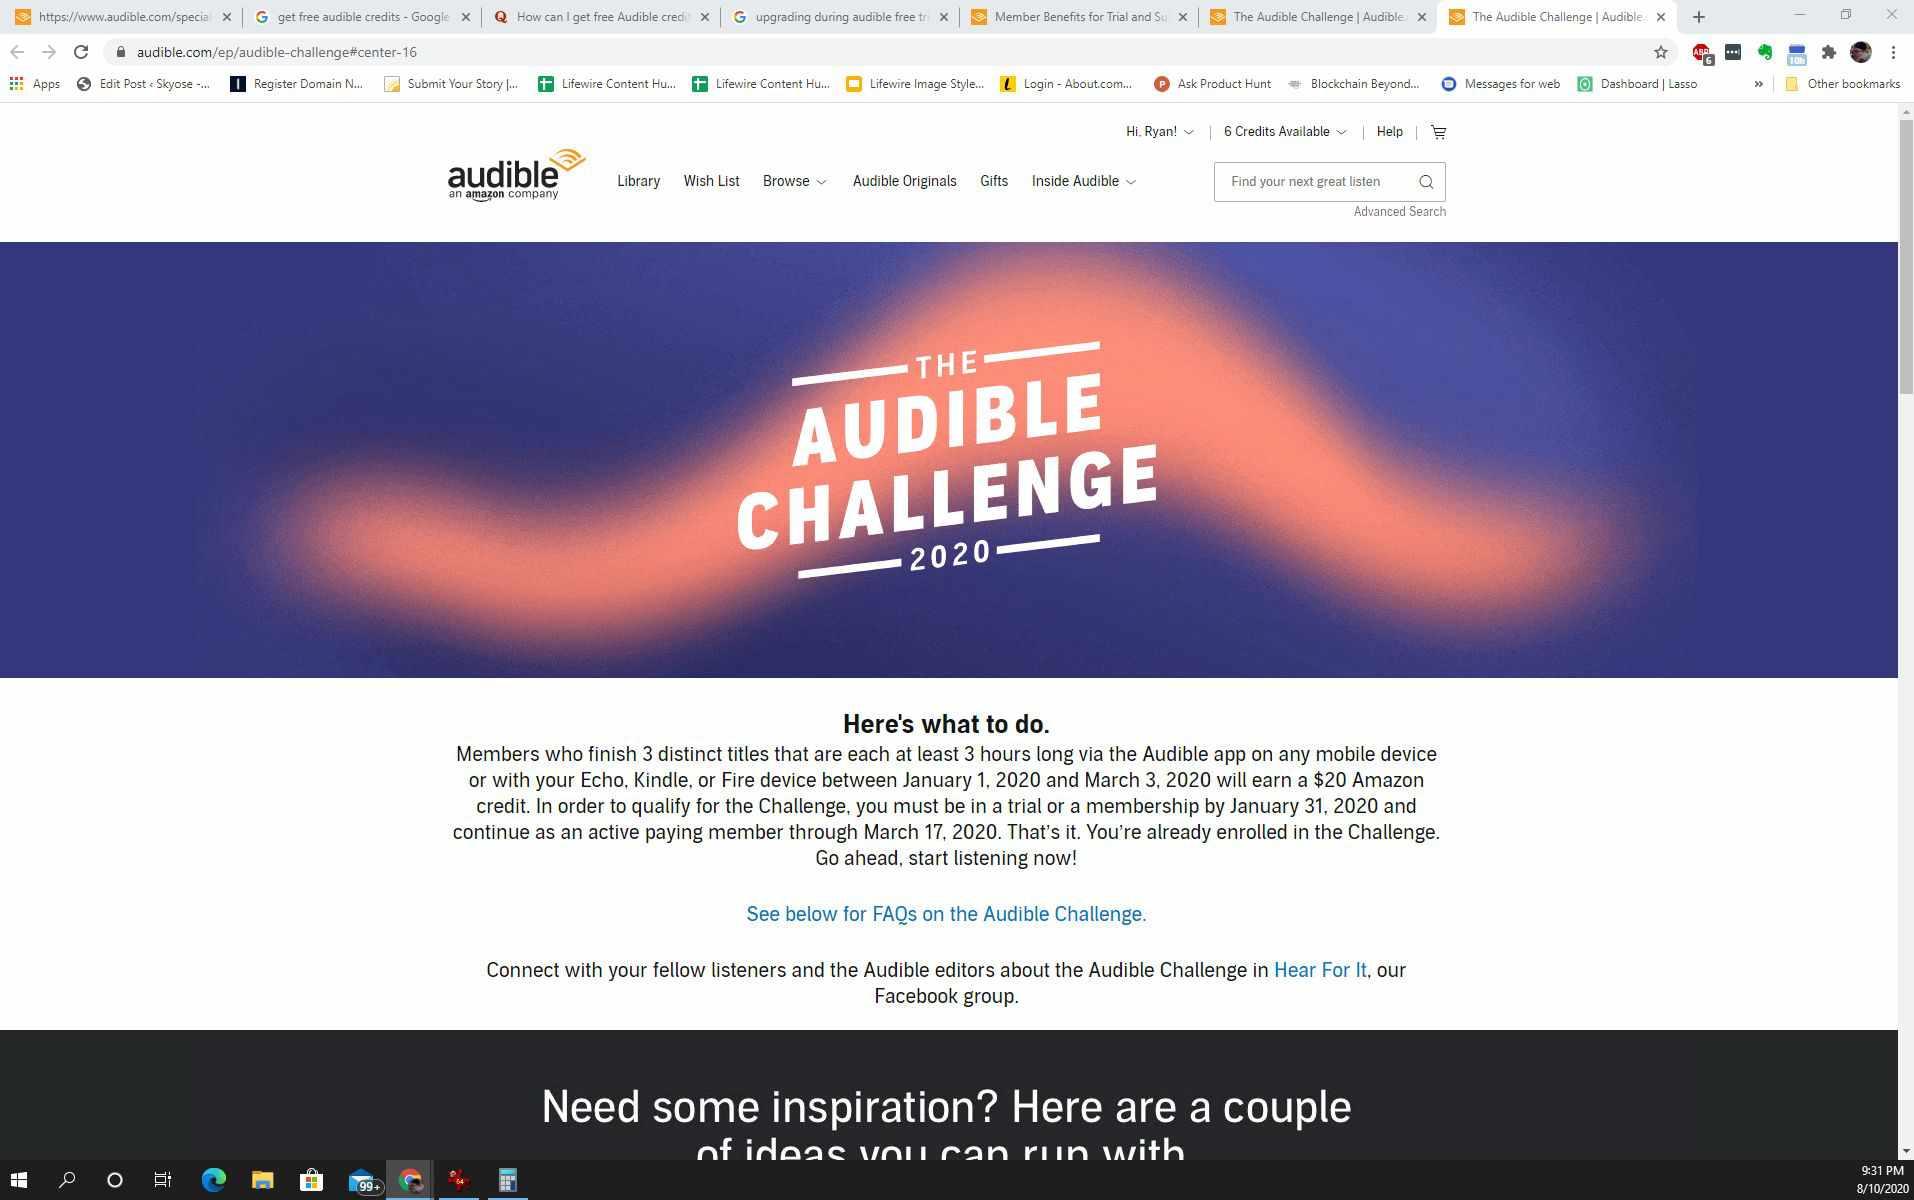 Screenshot of an Audible challenge